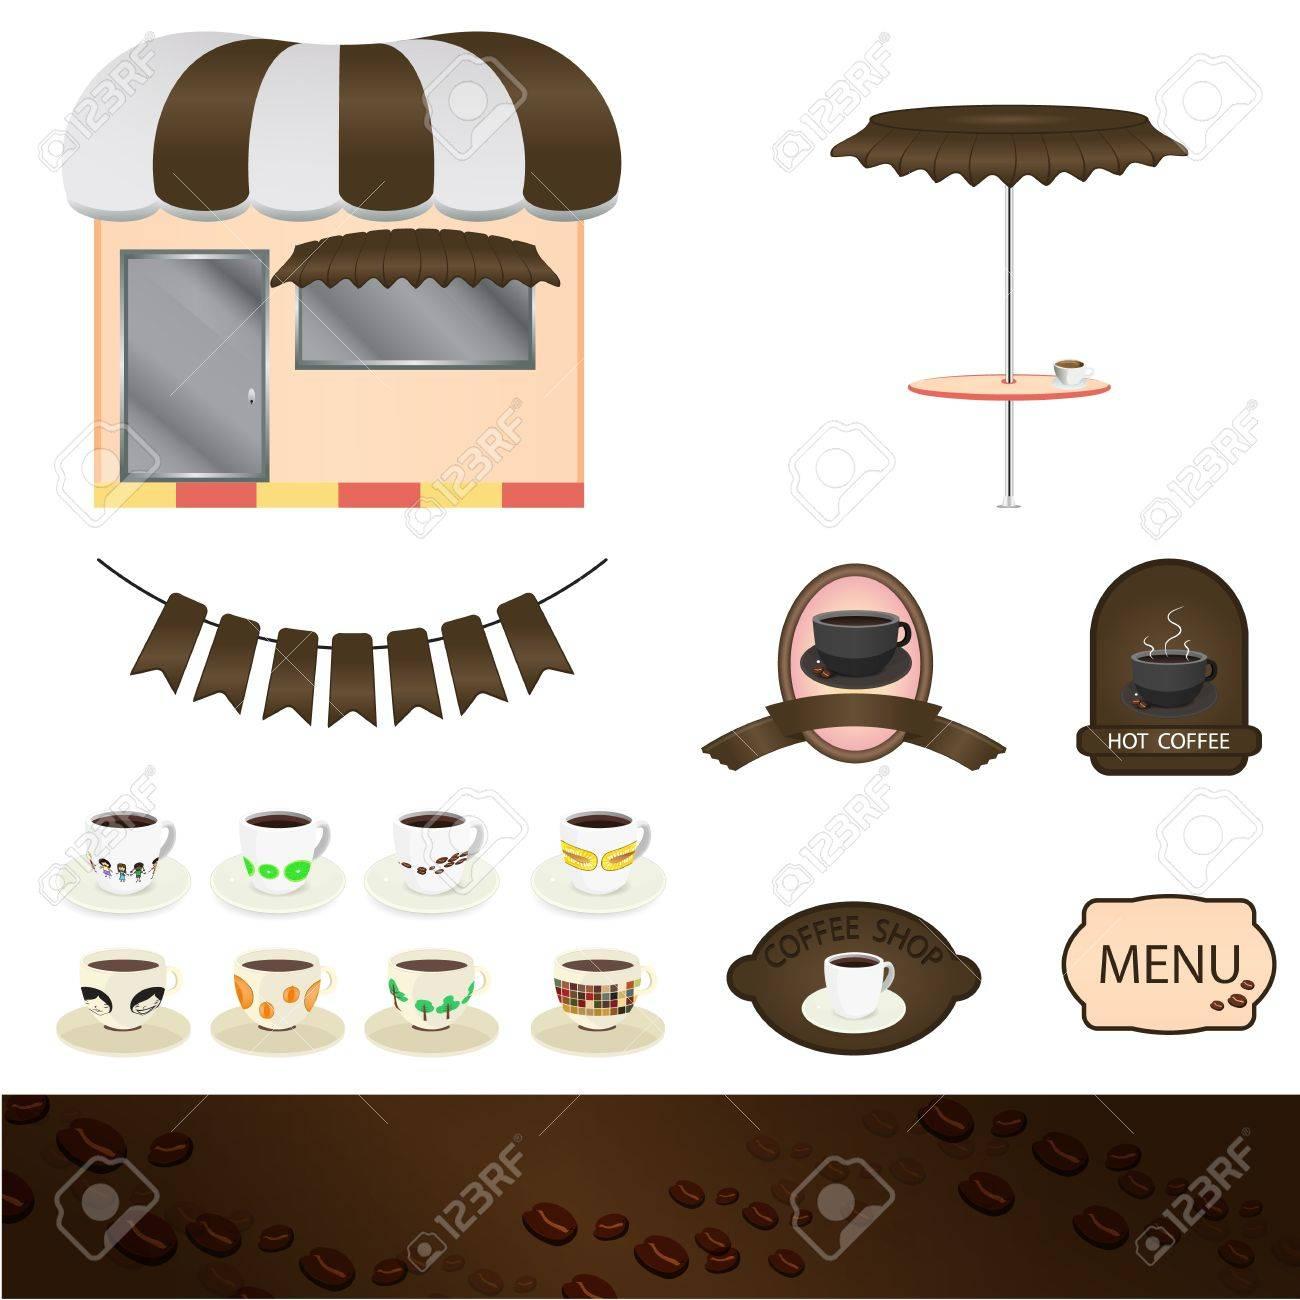 Coffee shop set graphic Stock Vector - 19011692